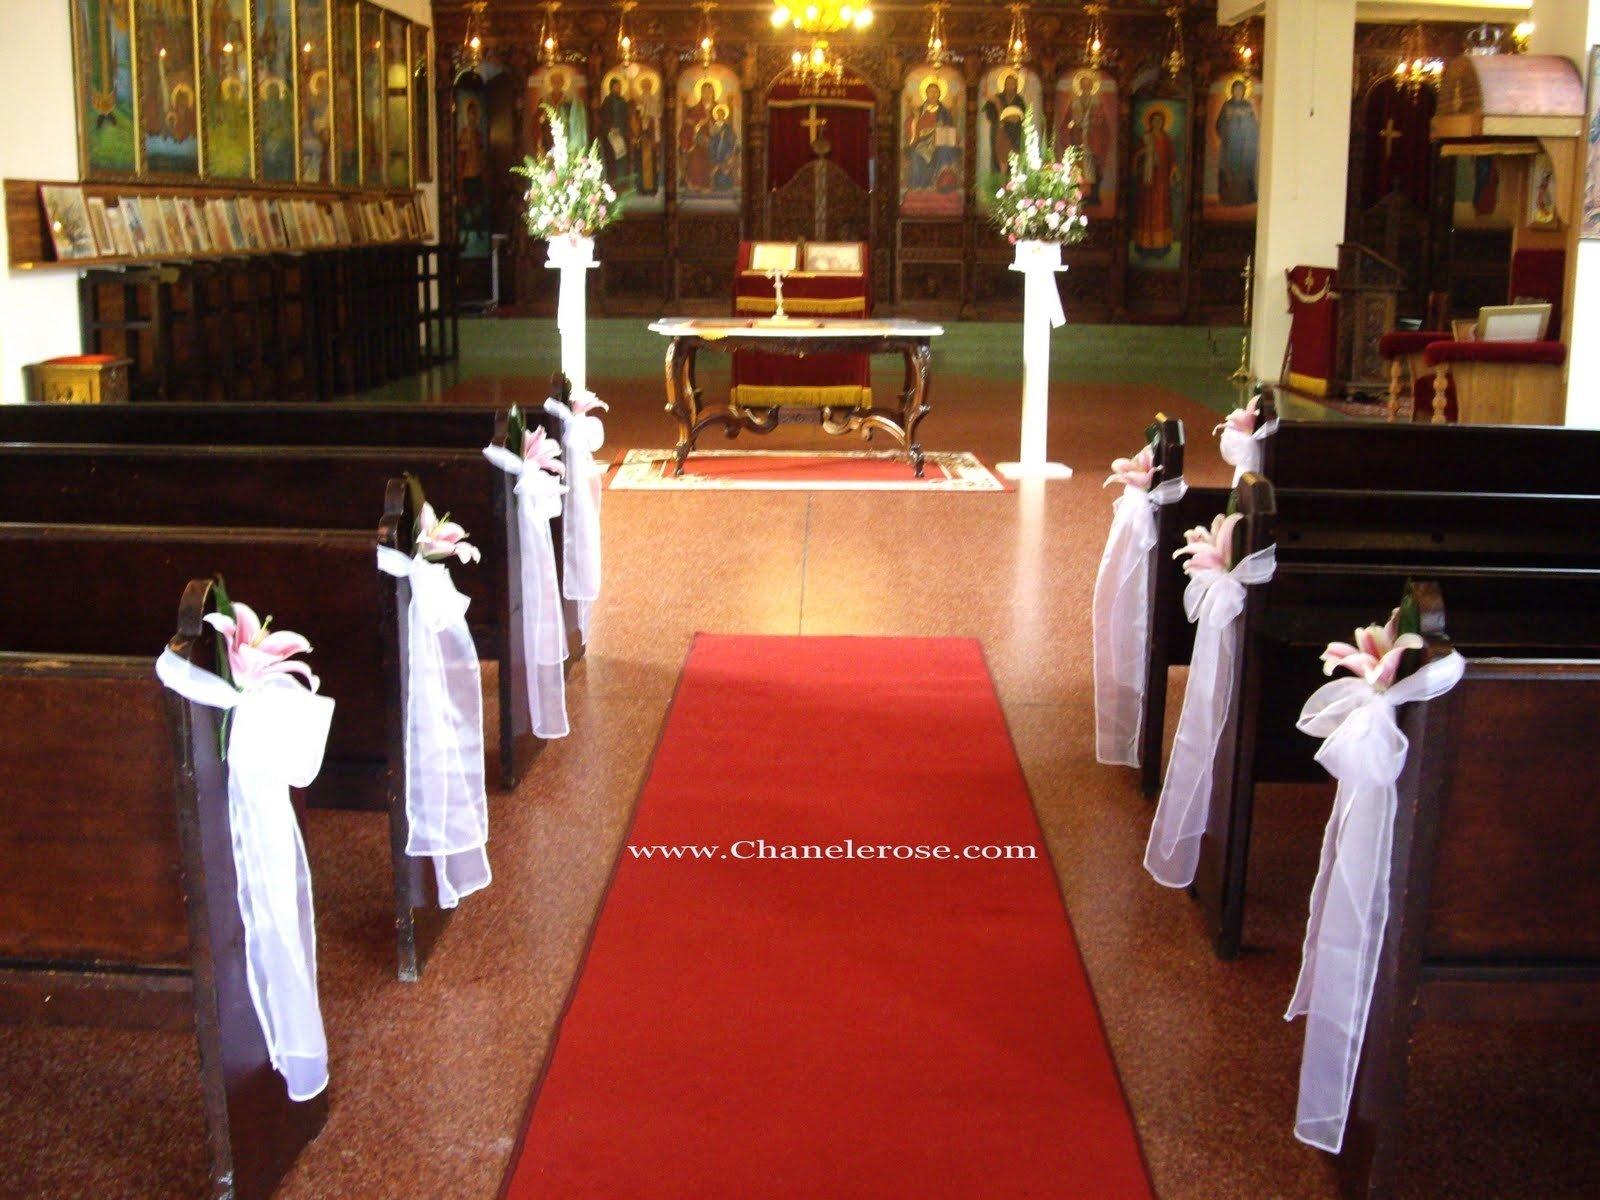 10 Great Wedding Decoration Ideas For Church church decorations for wedding sydney wedding stylist 2020